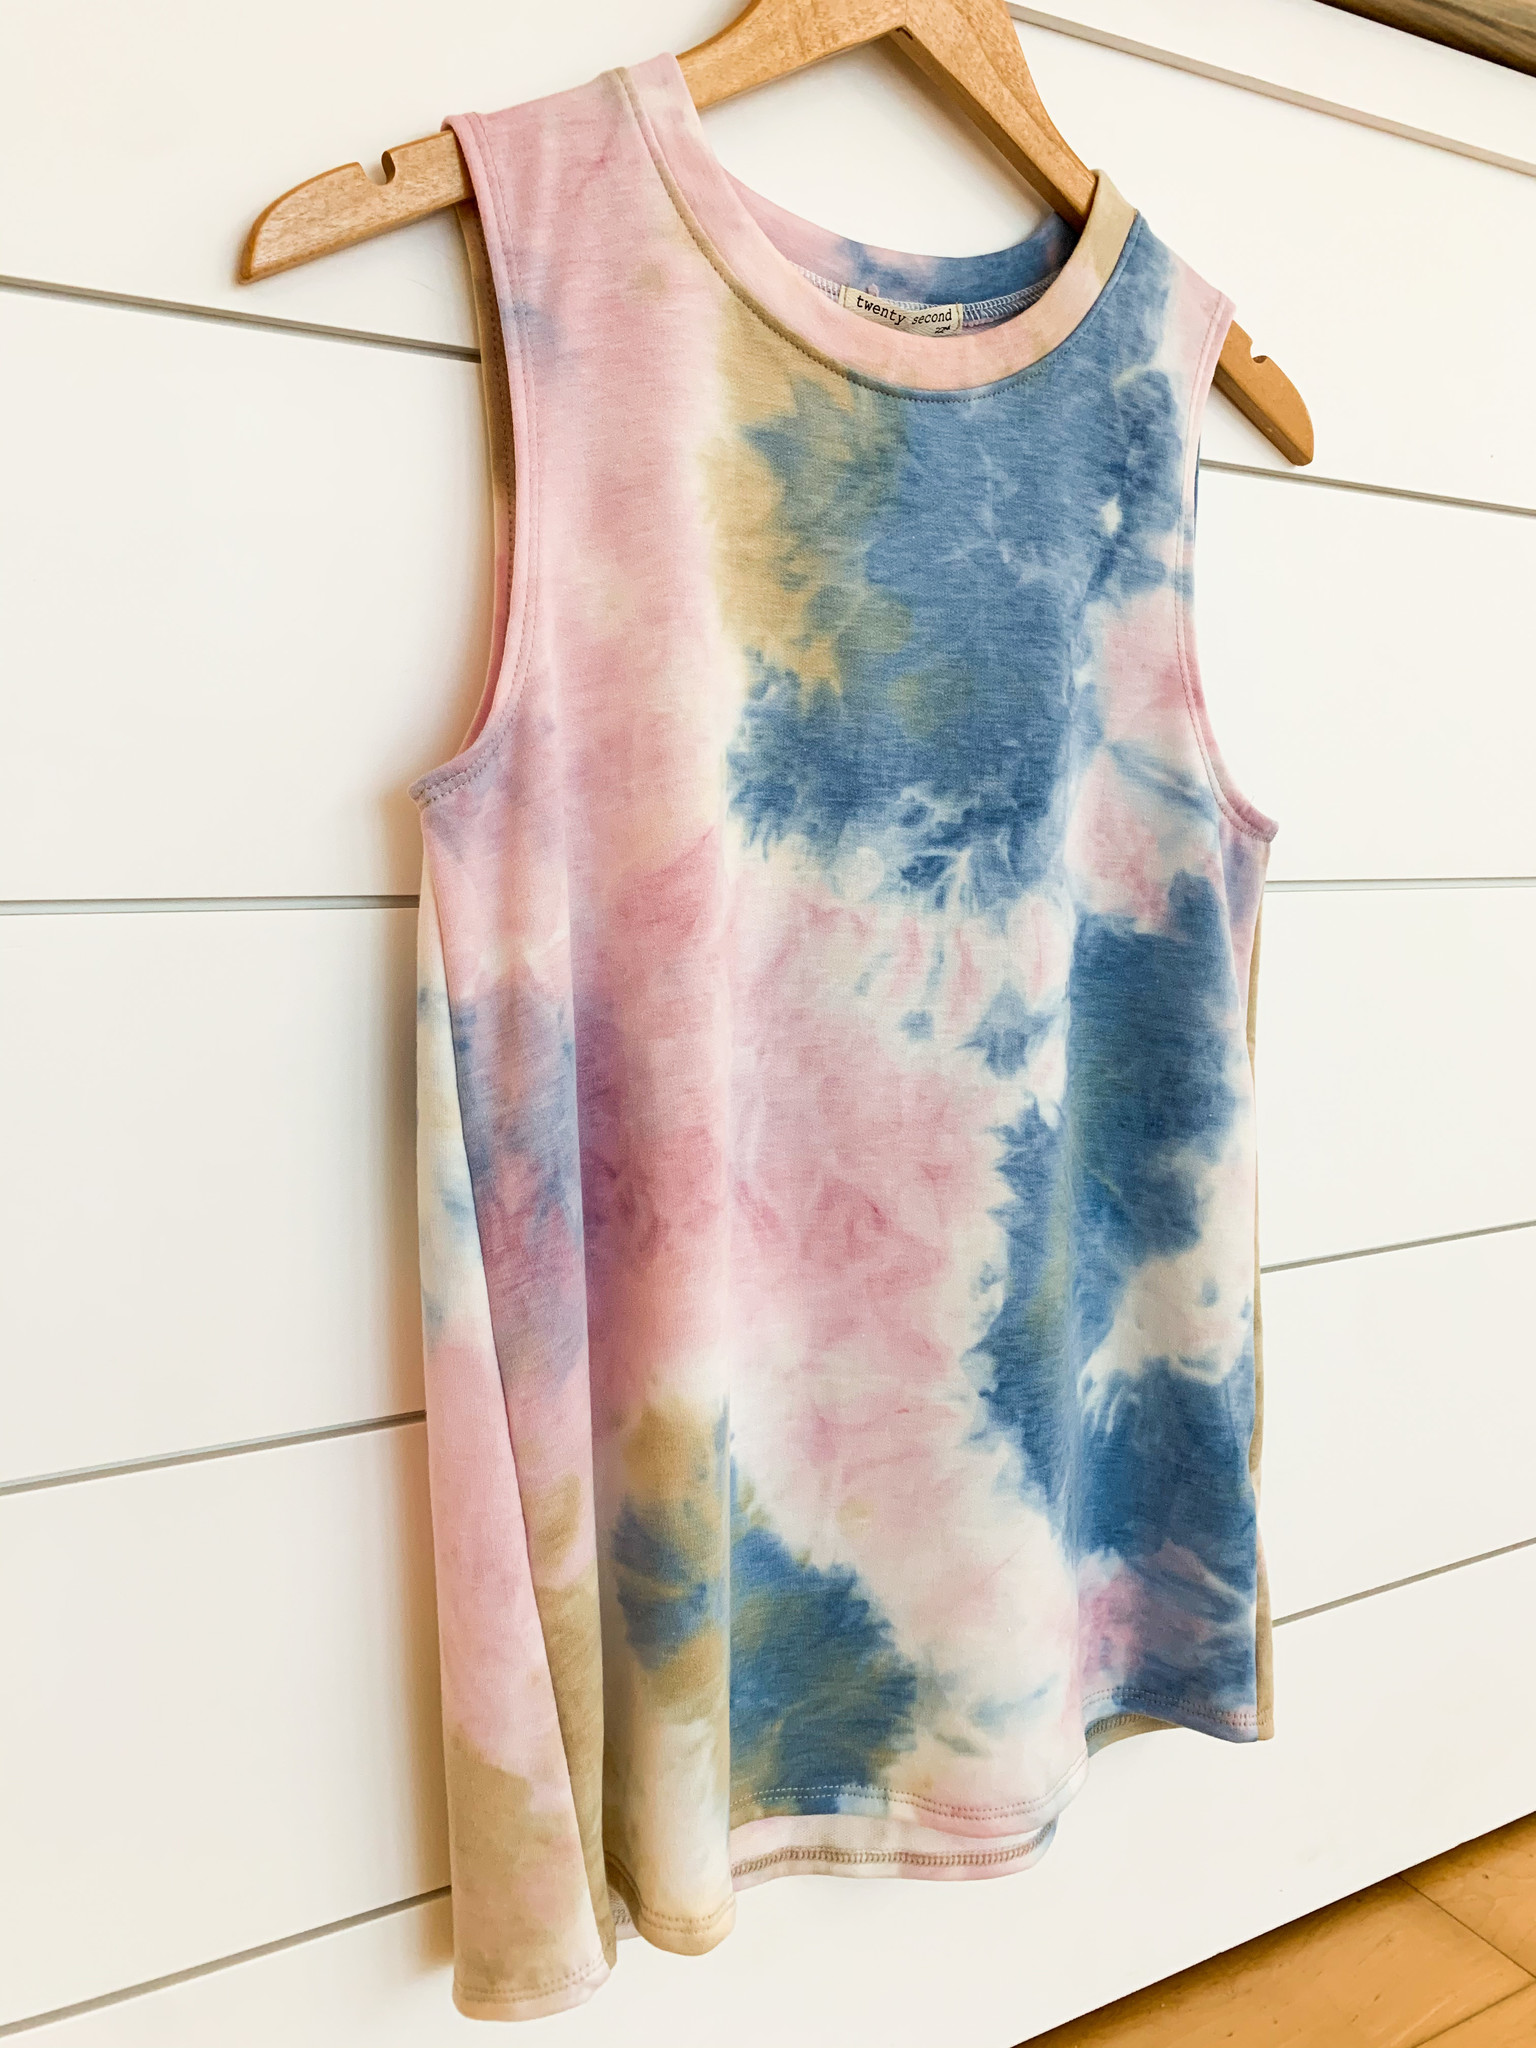 Lavender/Blue Tie Dye Sleeveless Top